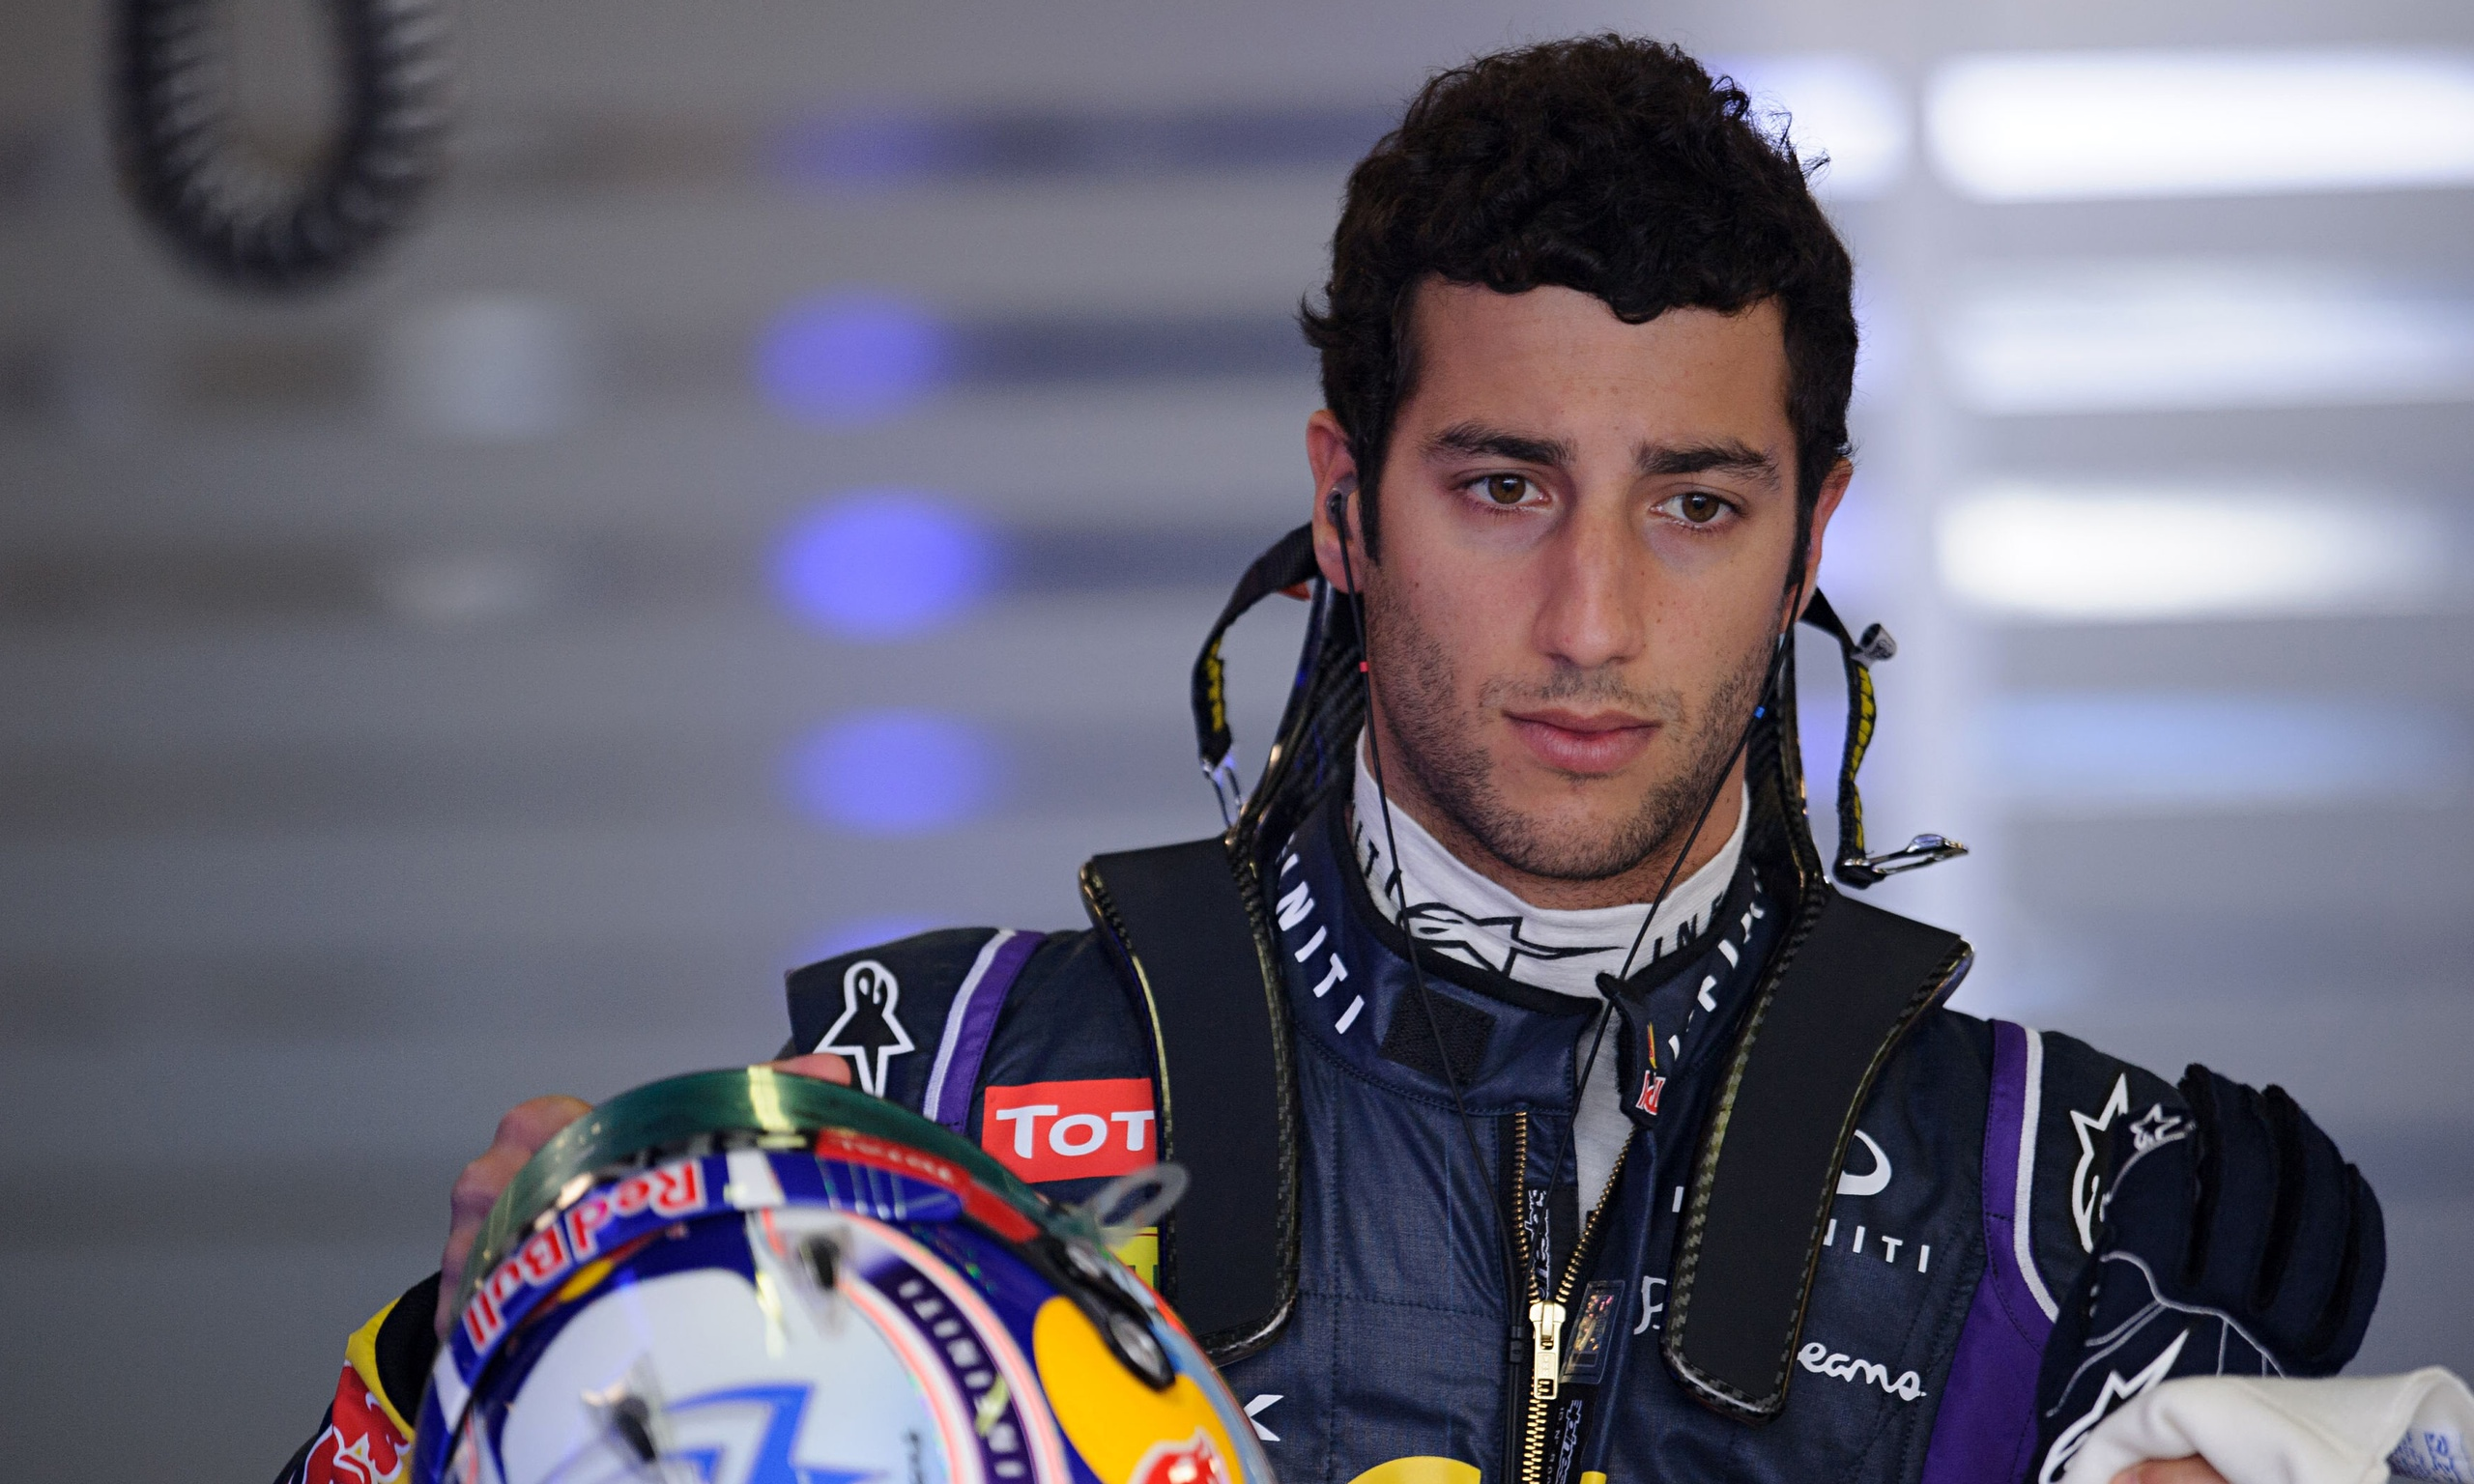 Red Bull confirm F1 appeal against Daniel Ricciardo's disqualification ...